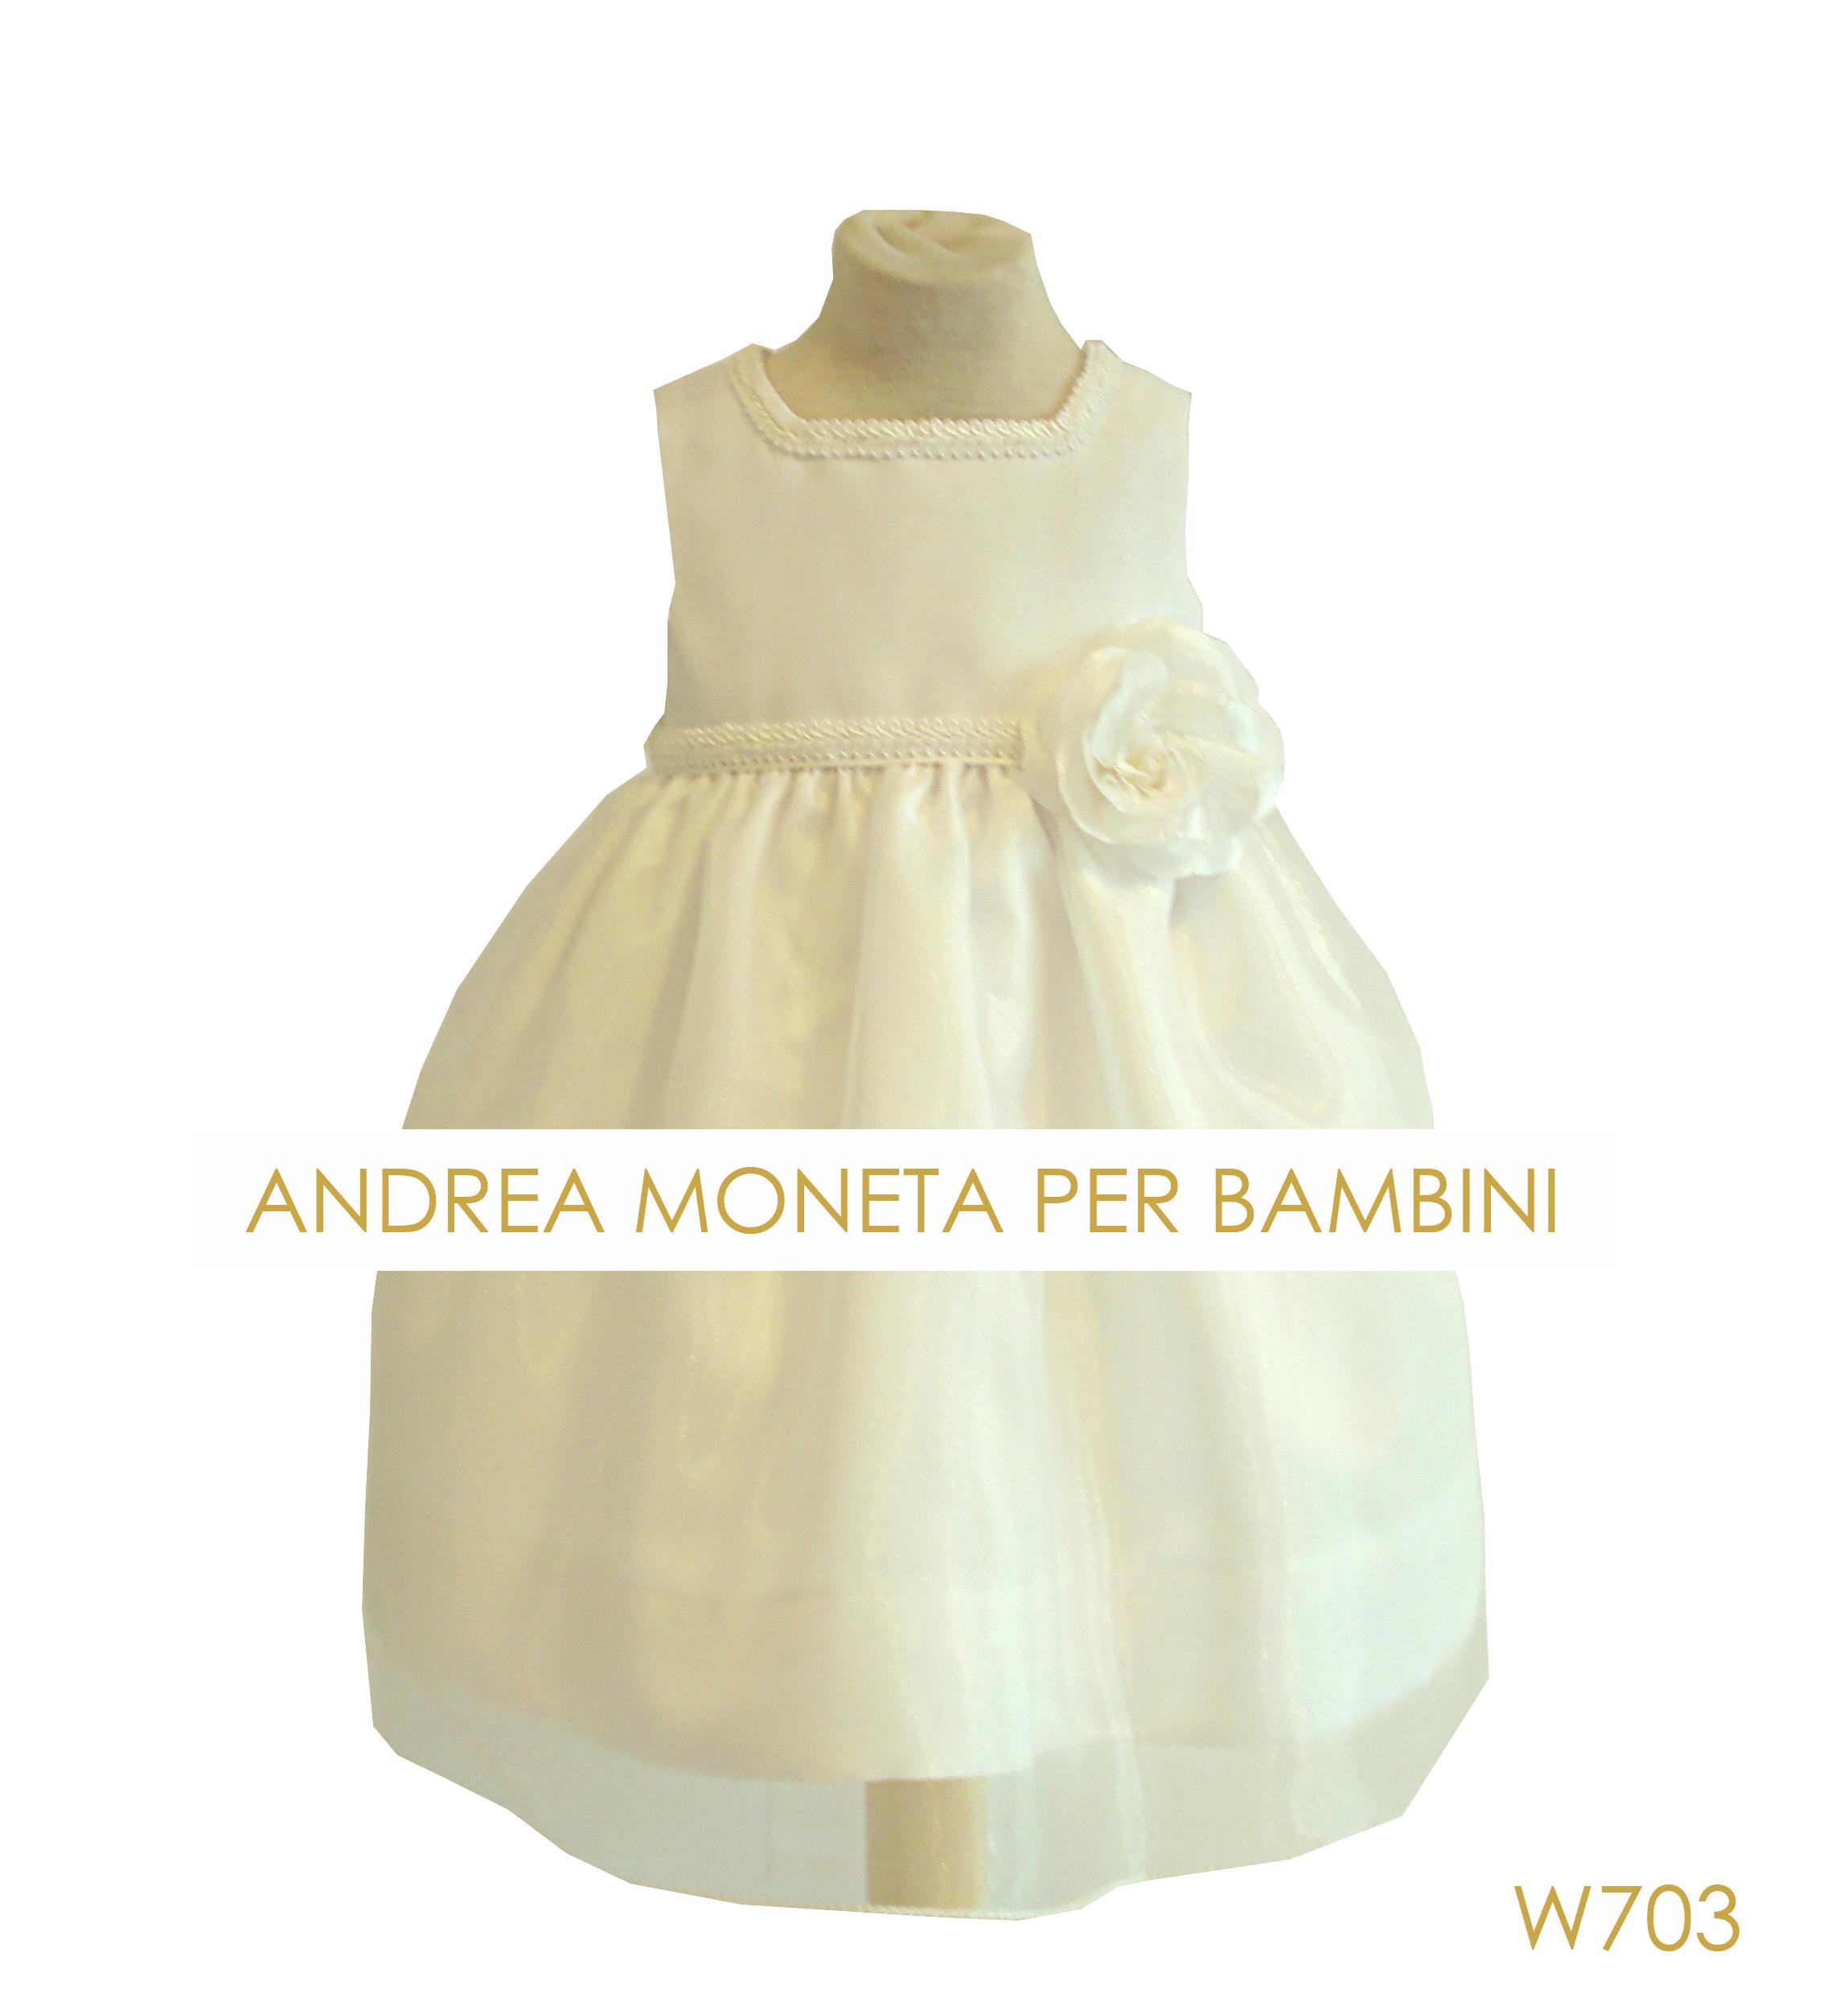 Vestido Blanco Bautizo Fiesta Bebe Niña tira Chanel Andrea Moneta Handmade White Dress Baby Girl Chanel Style w703 http://vestidotienda.com/products/cx4nu8m3nn